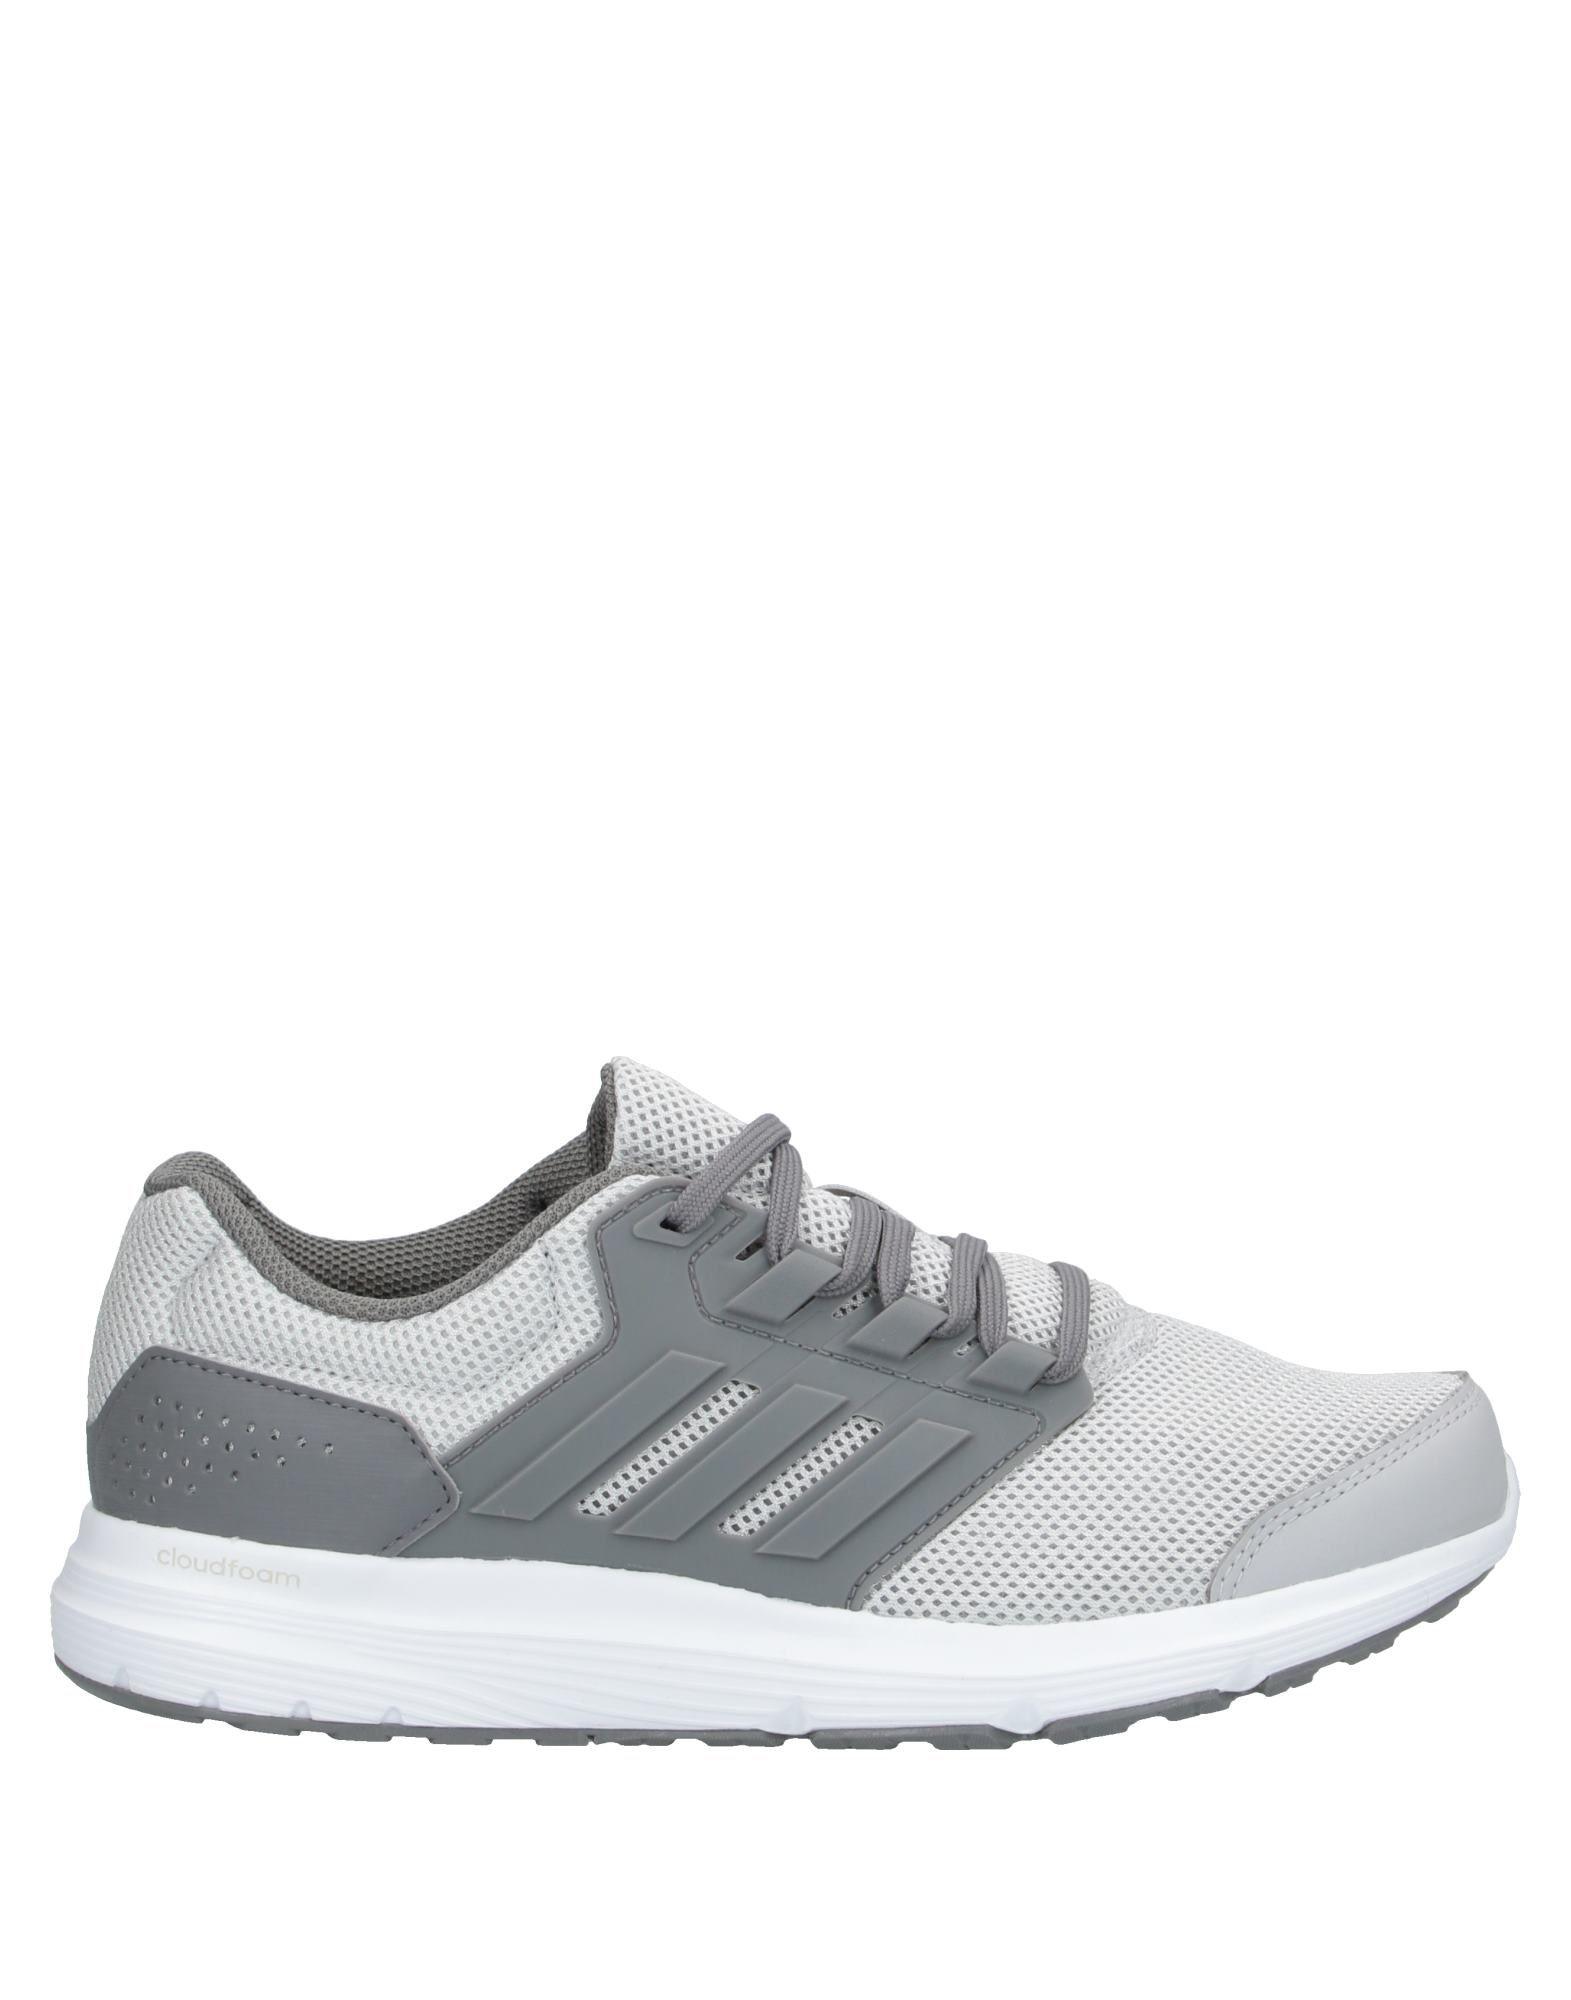 Turnschuhe Adidas herren - 11718185 F